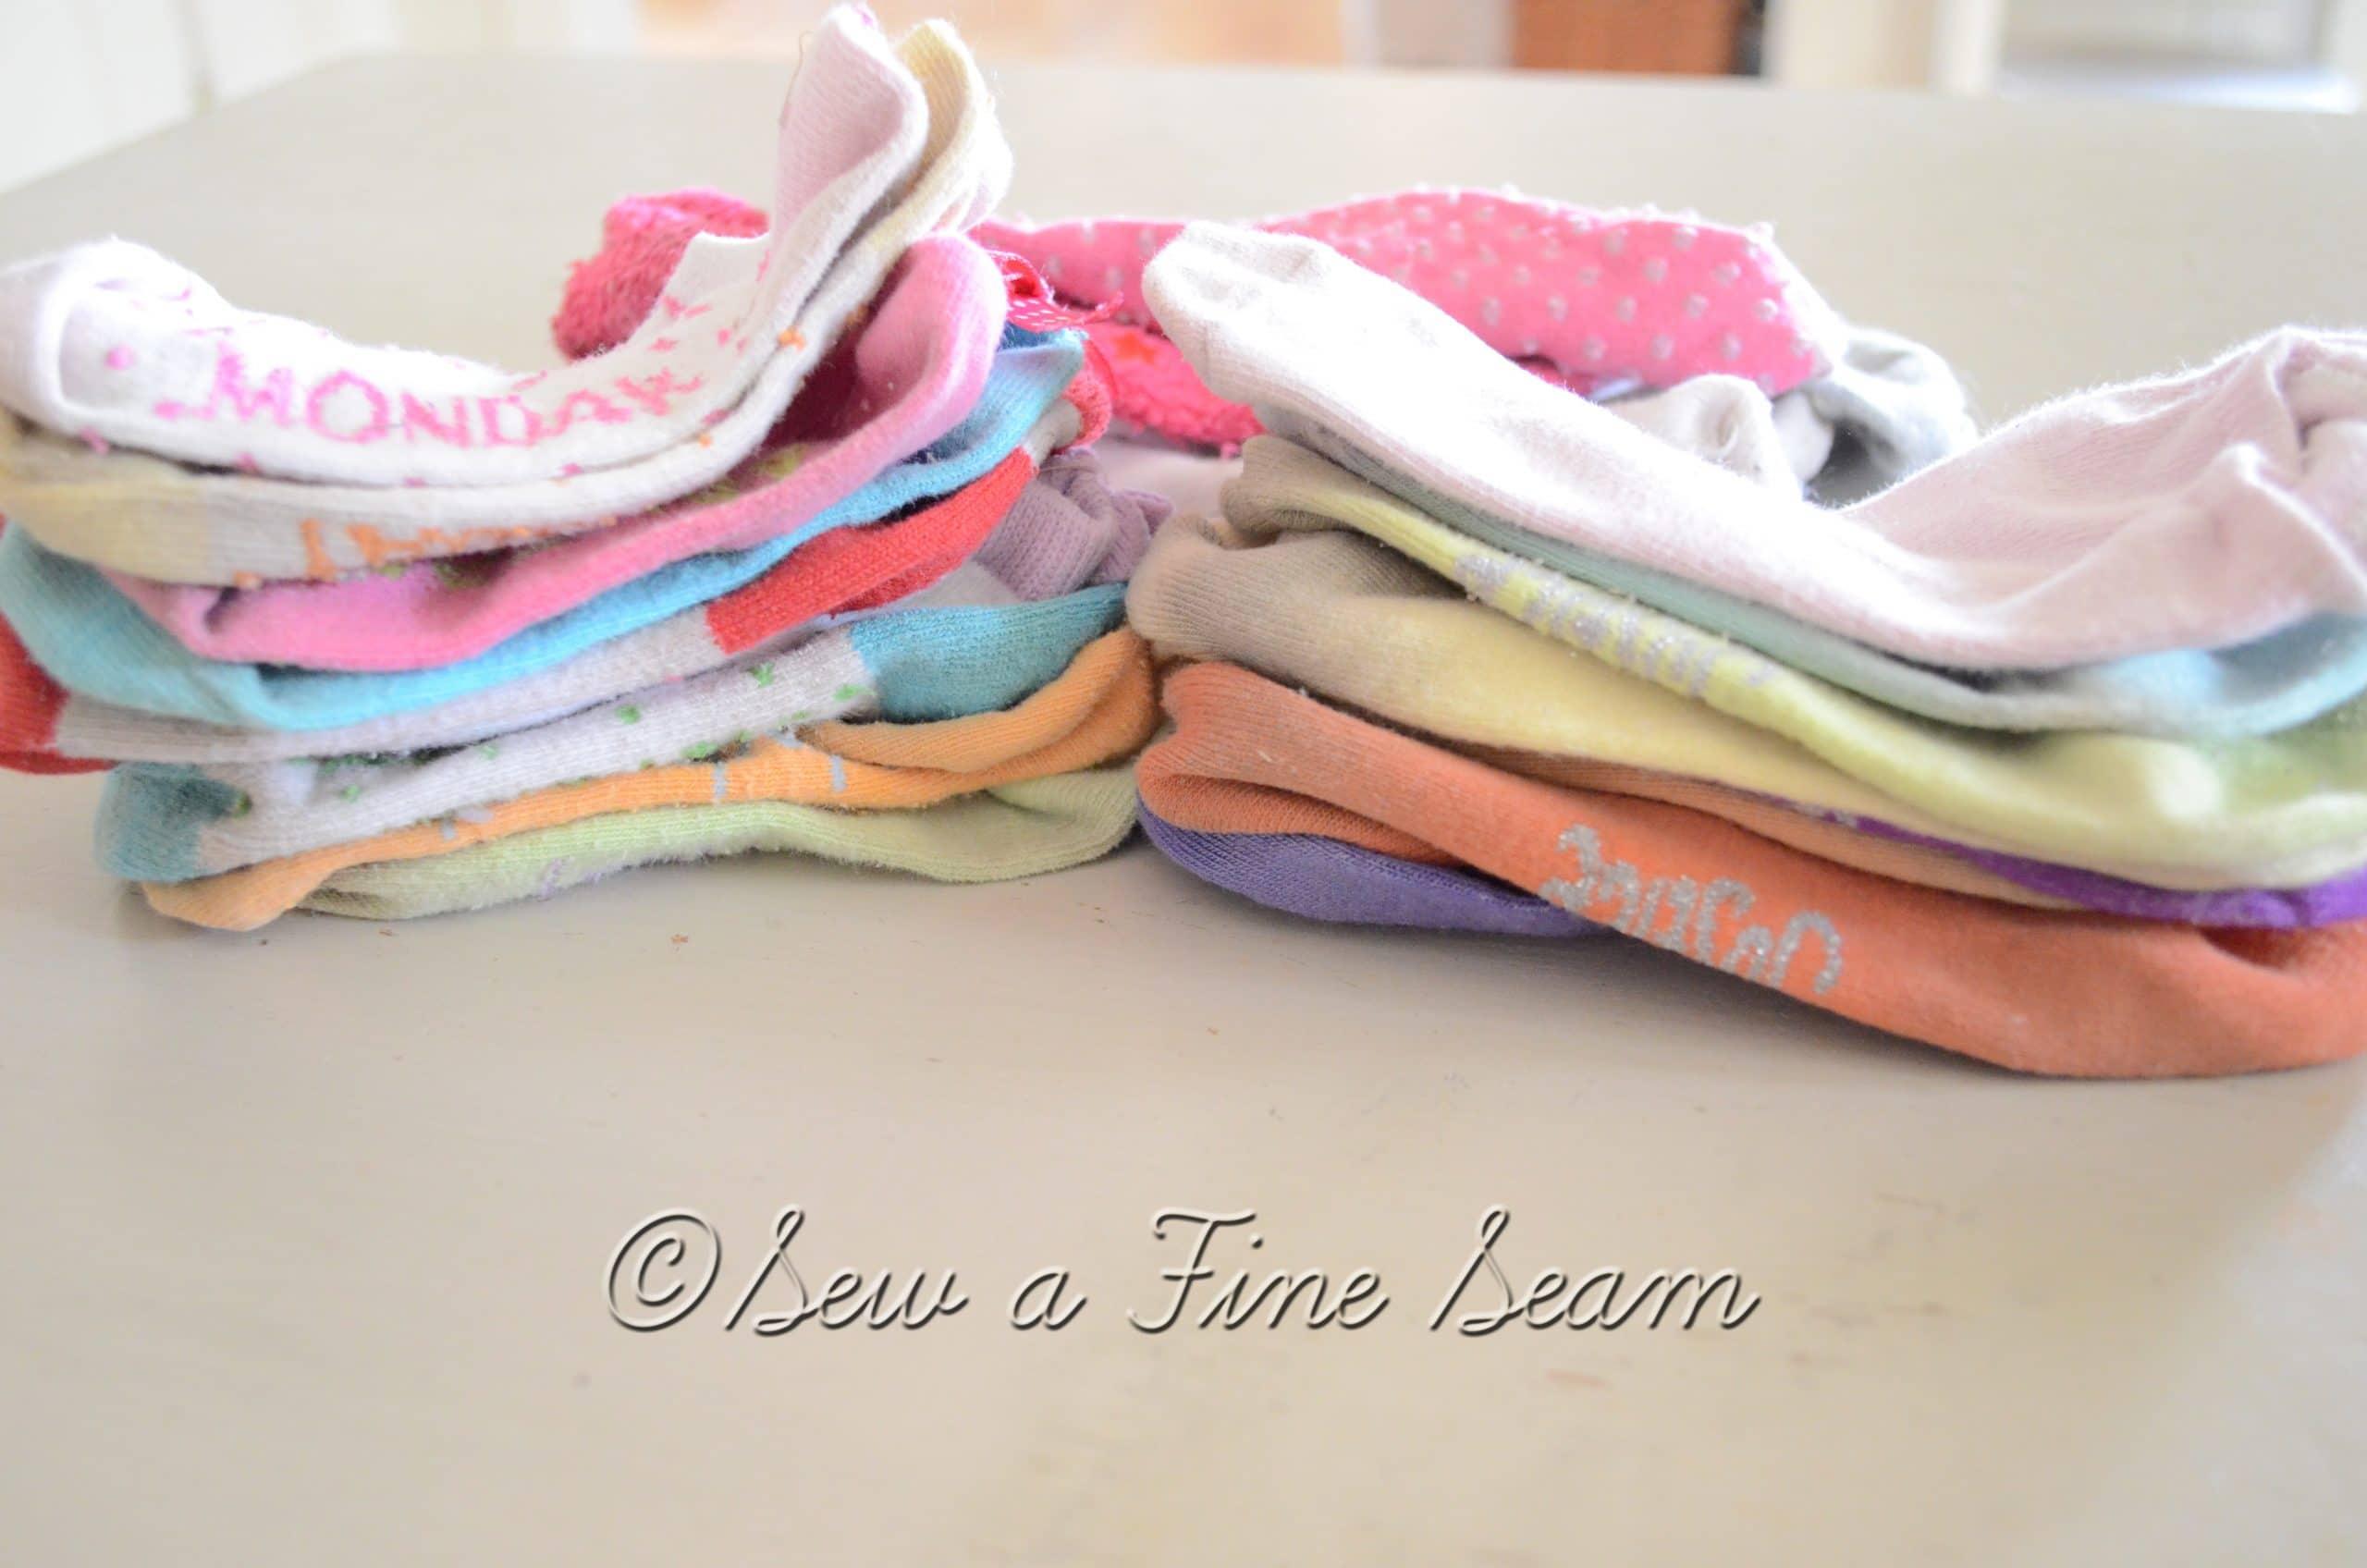 Sorting Socks